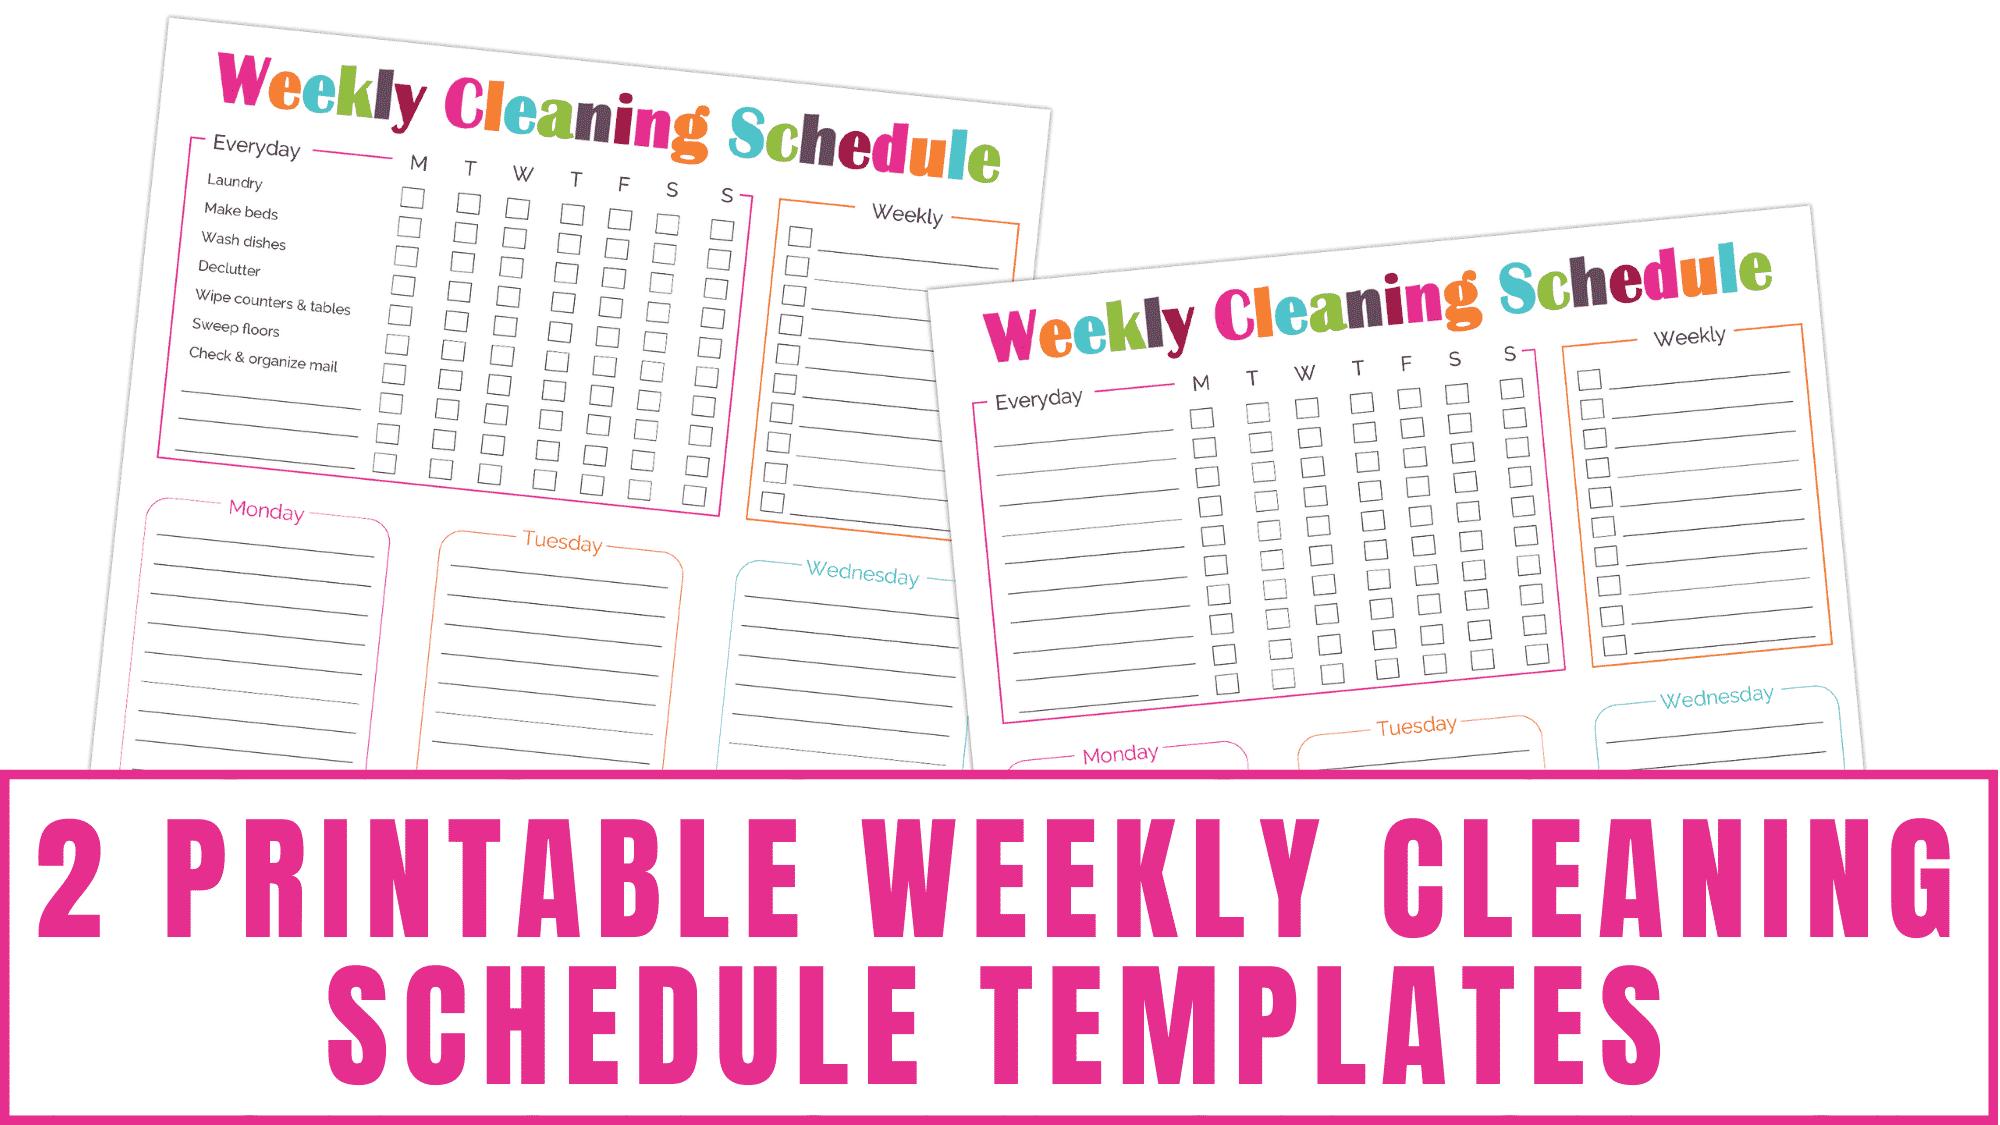 20 Printable Weekly Cleaning Schedule Templates   Freebie Finding Mom